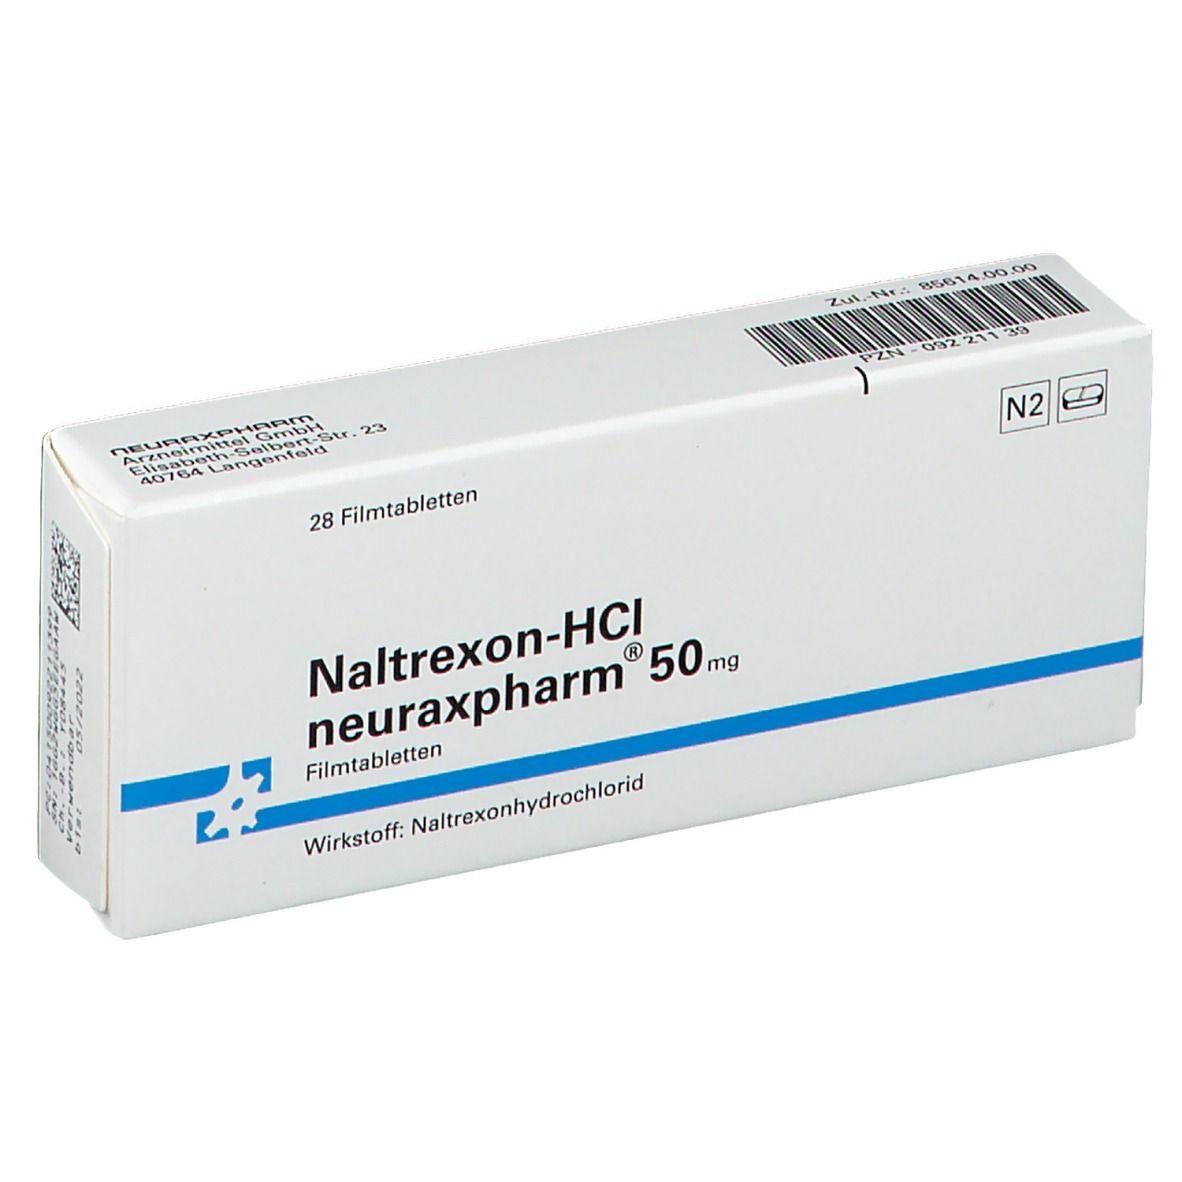 NALTREXON HCl neuraxpharm 50 mg Filmtabletten